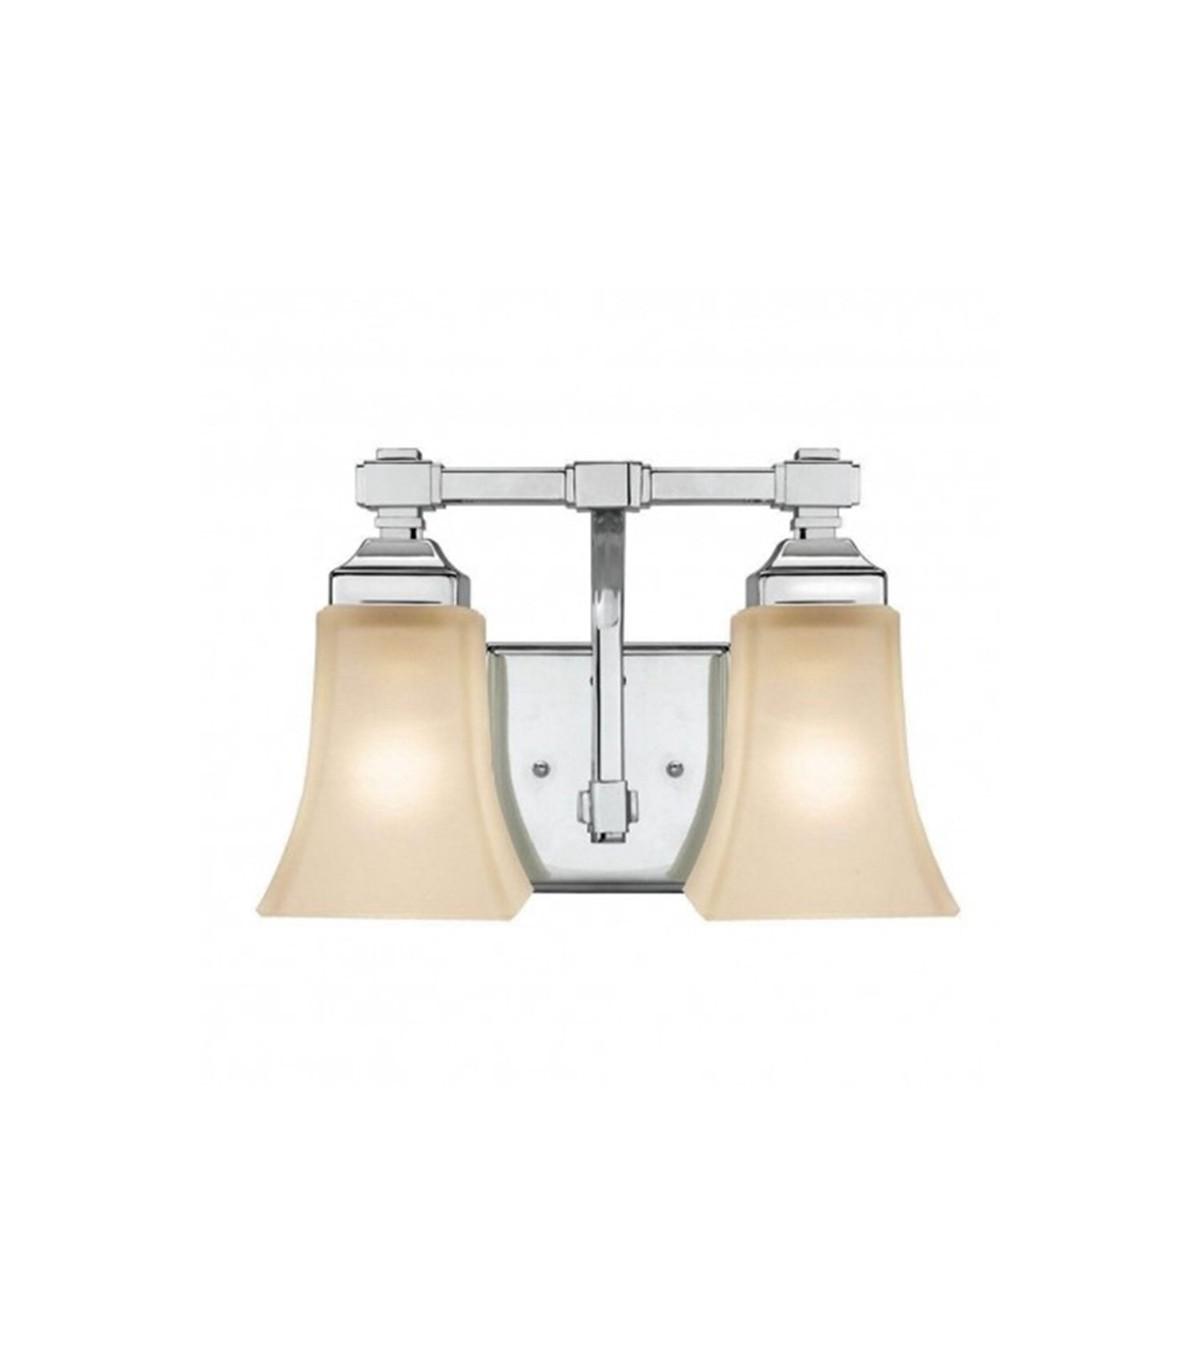 Hampton Bay 2-Light Chrome Vanity Light Fixture